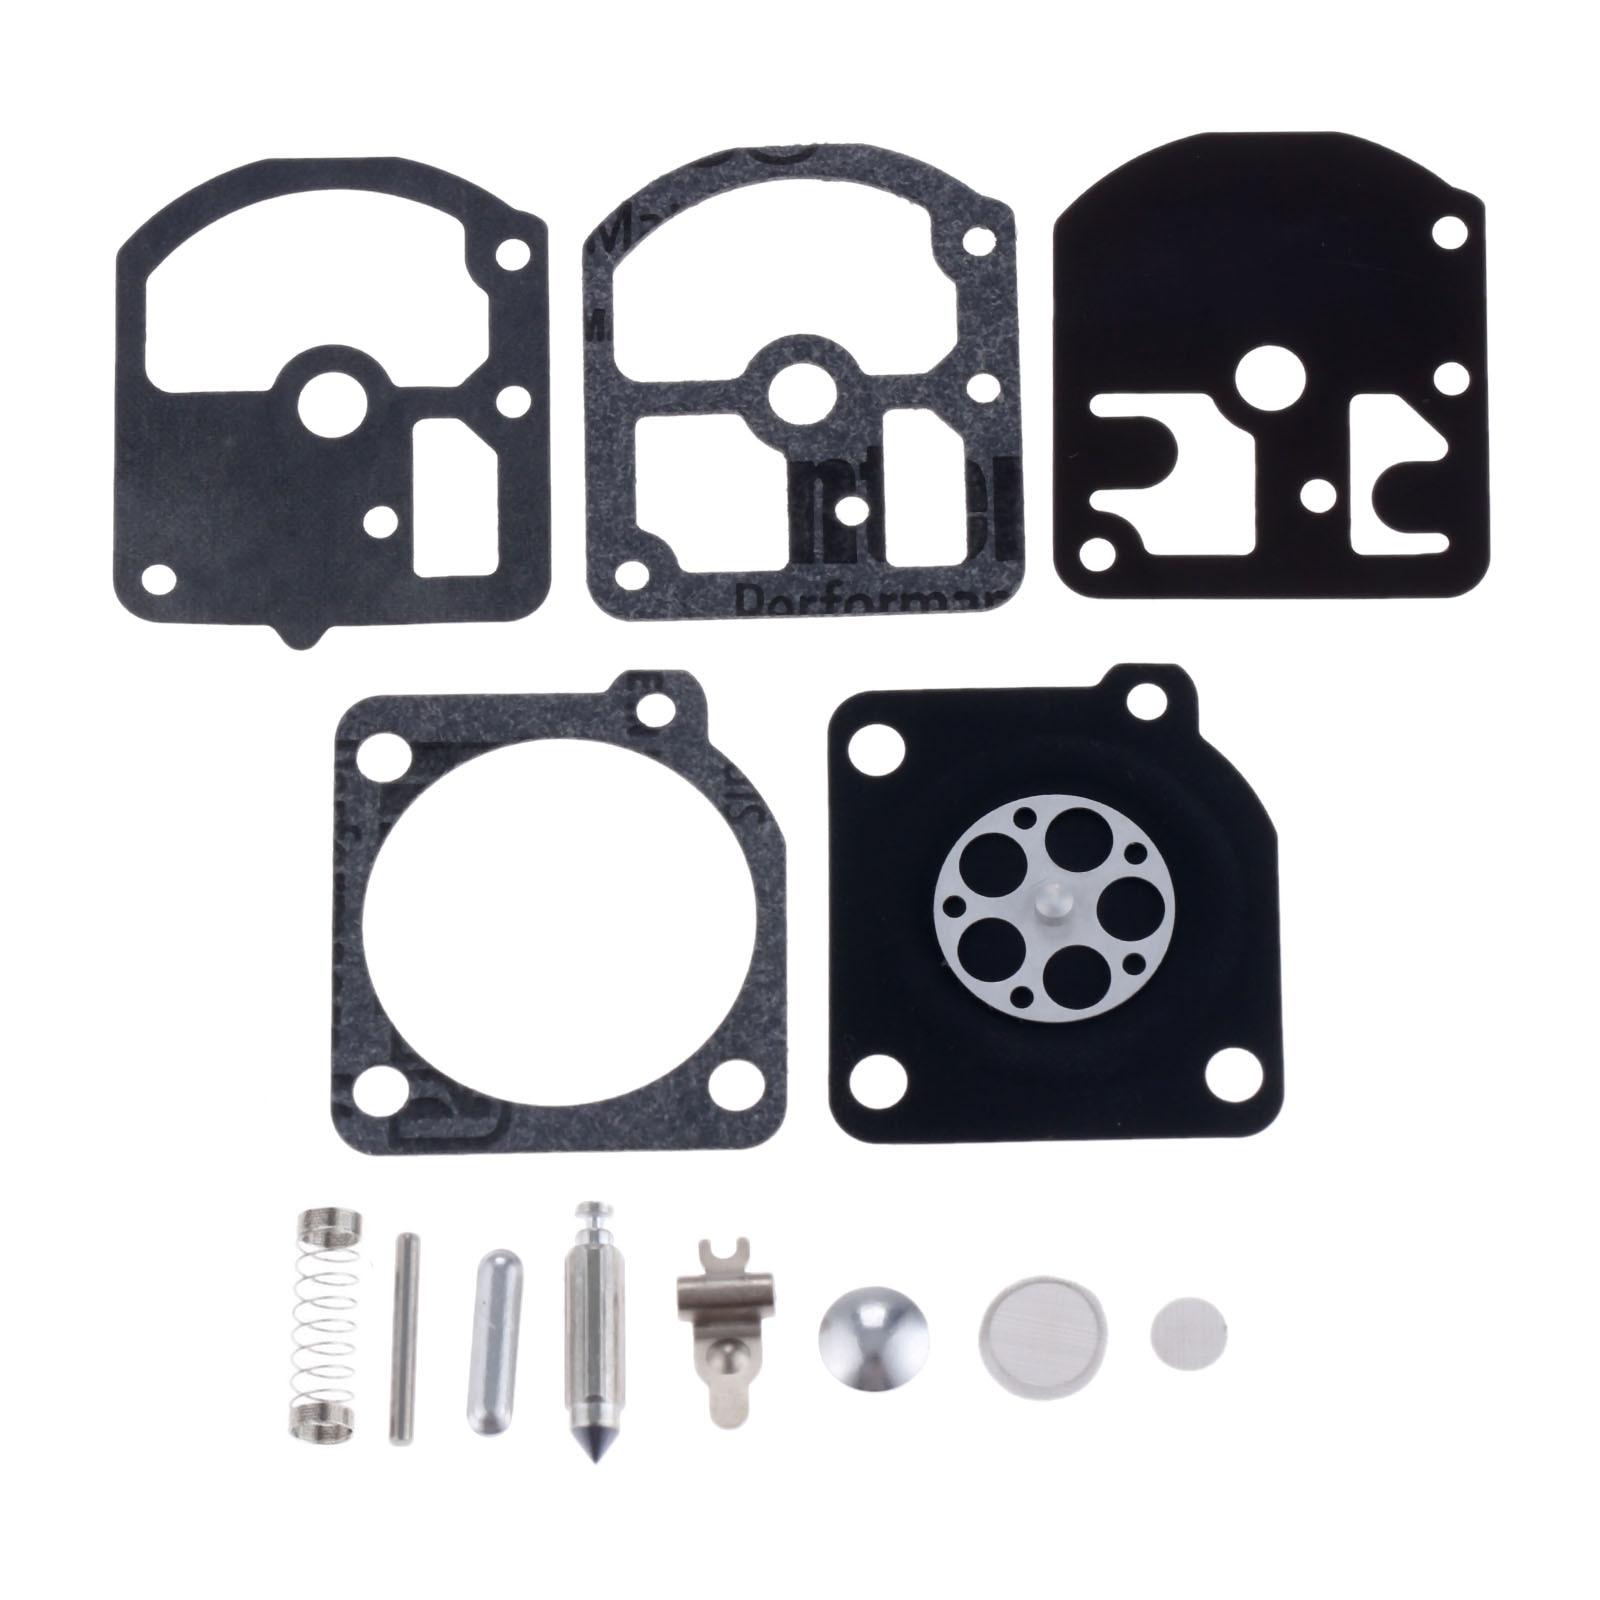 DRELD Carburetor Repair Kit Fit For Echo CS280E CS280EP Chainsaw Zama C1S-K1D Carbs HOMELITE 240 STIHL 09 010 TRIMMER CHAINSAWS